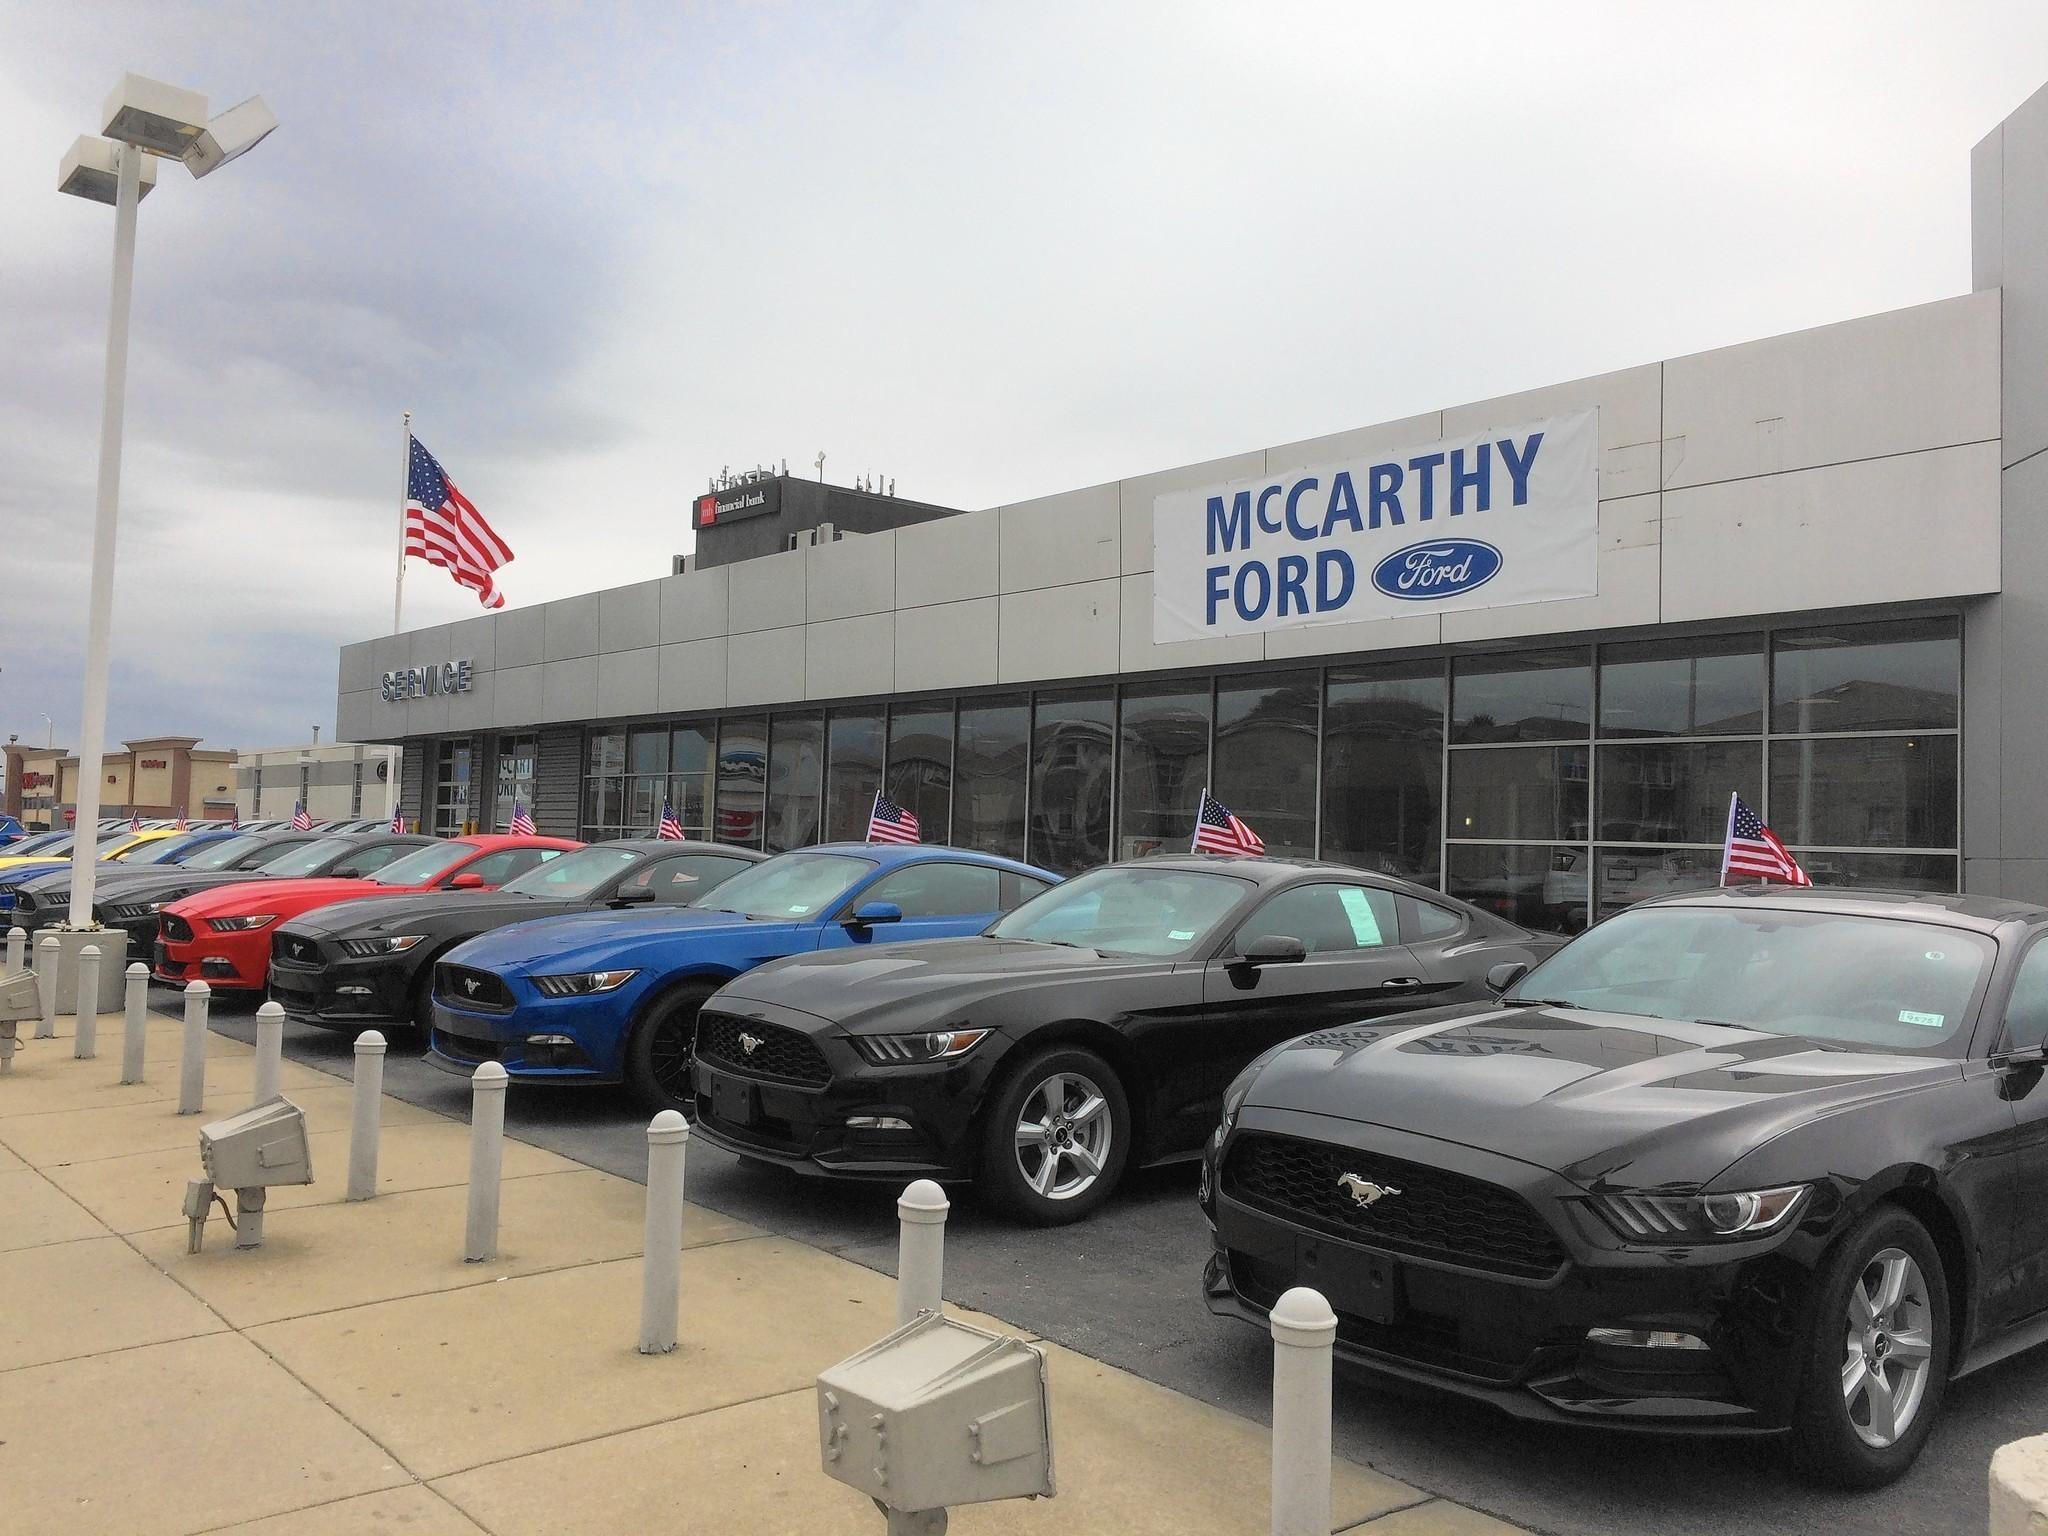 Members of Oak Park-based family buy Ford dealership in ... - photo#7